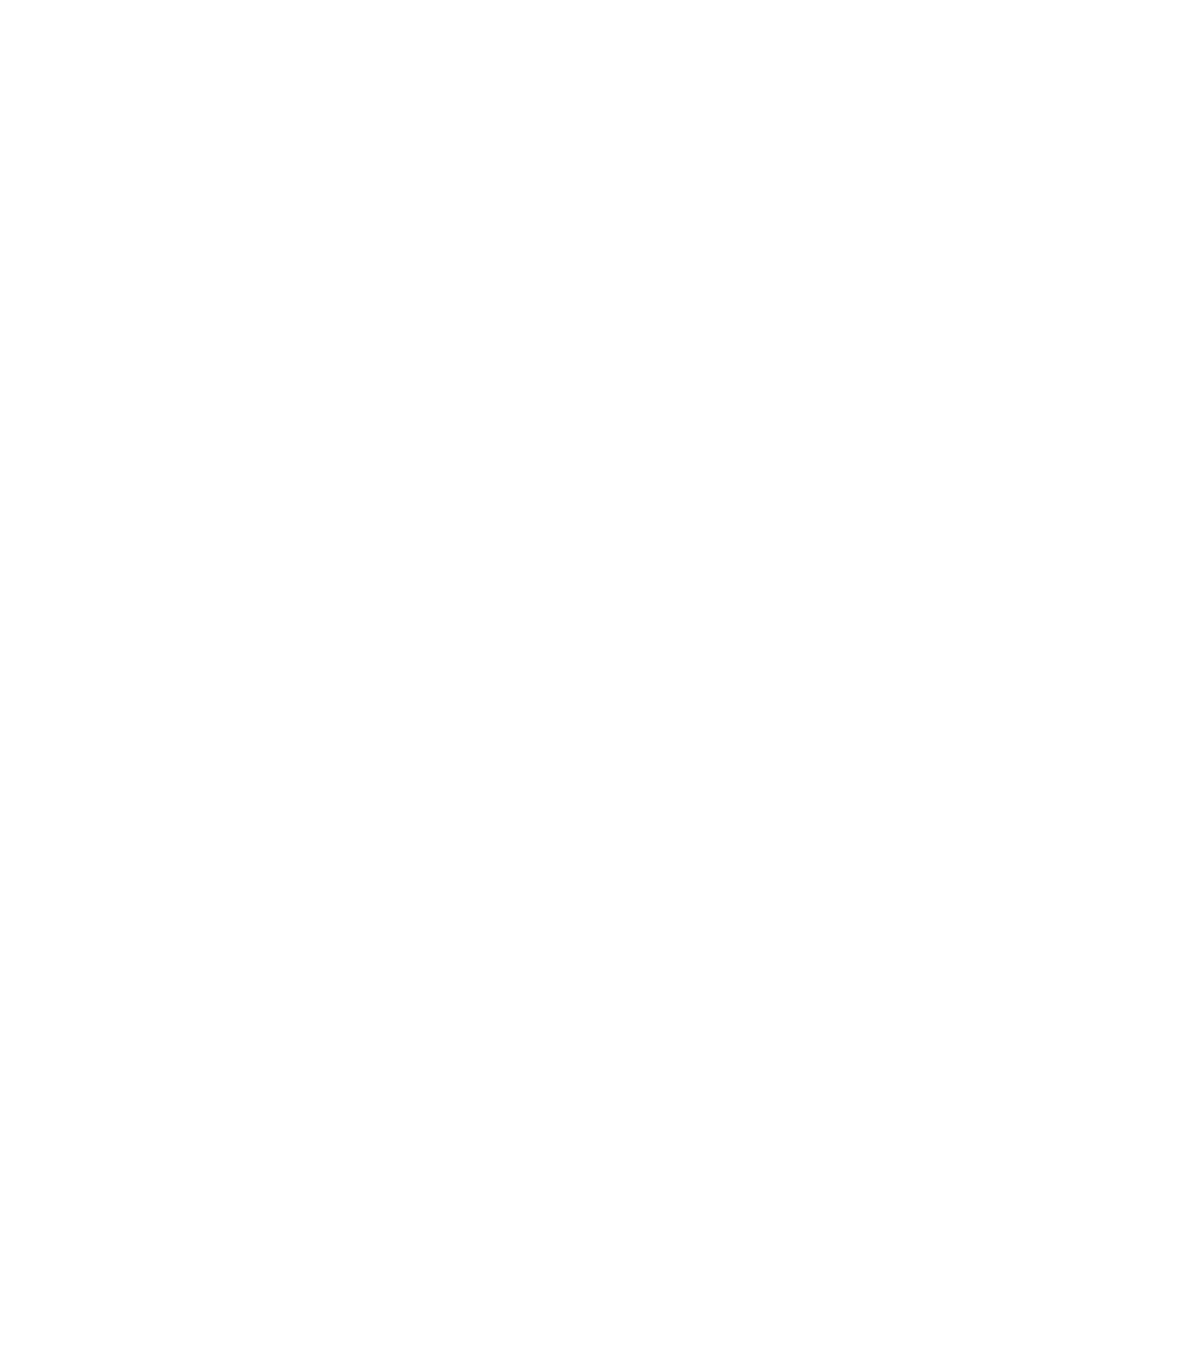 Pala emblem logo